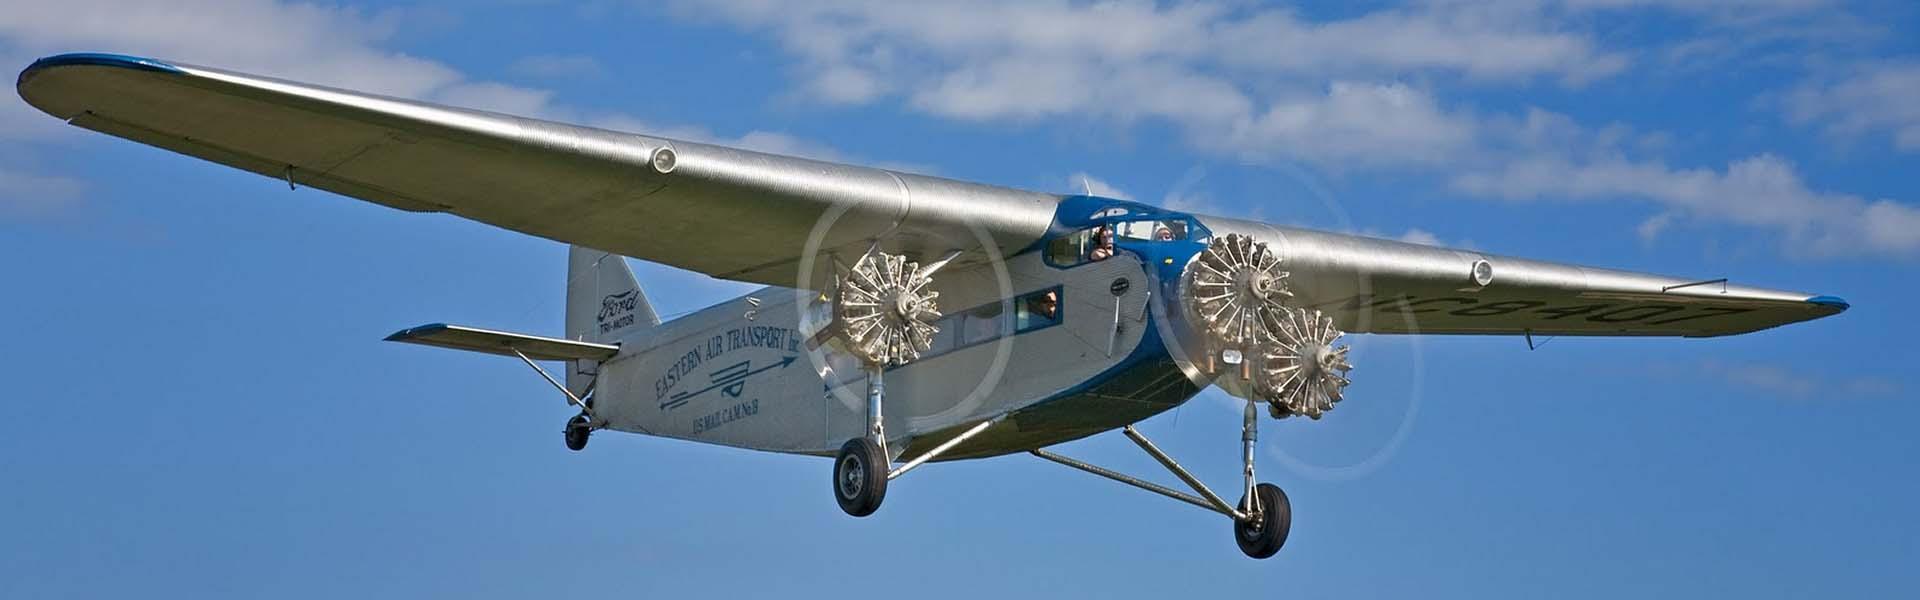 Ford Tri Motor Tour Hiller Aviation Museum